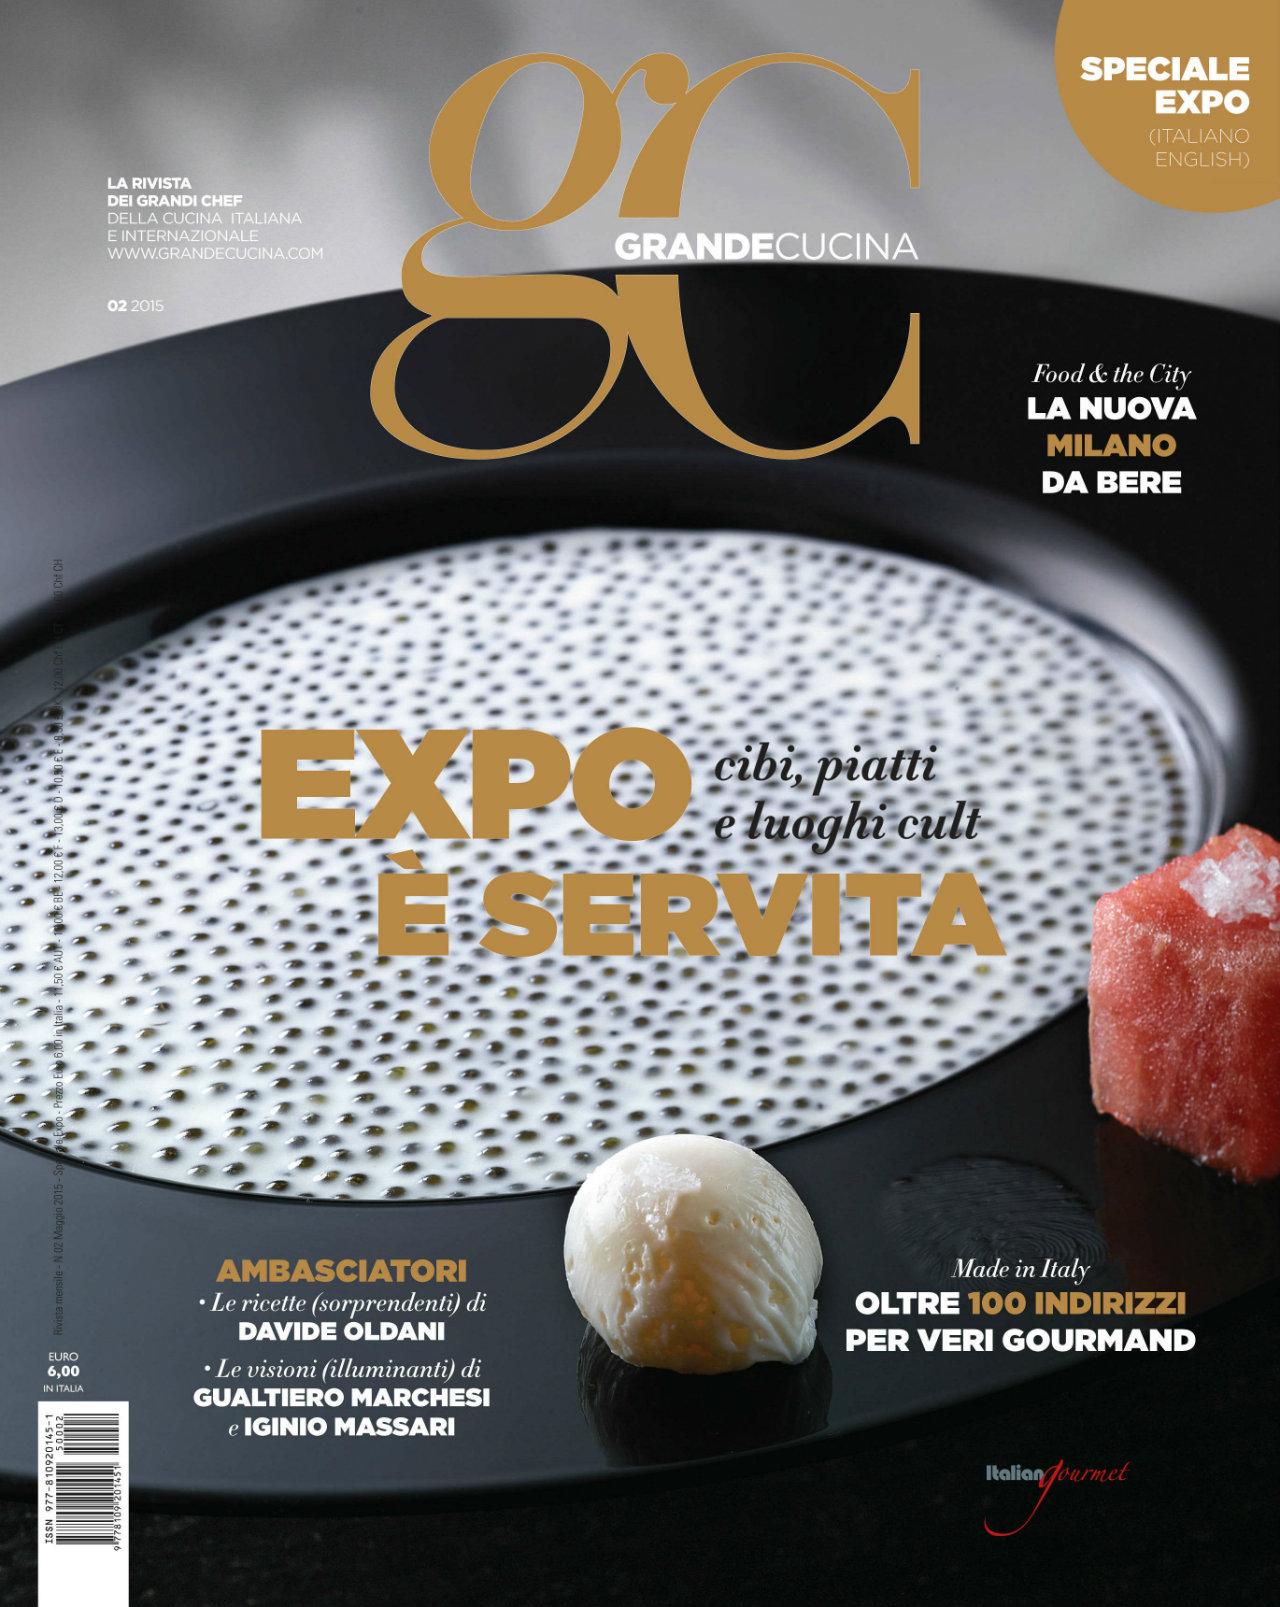 COP_GC02_15 copertina